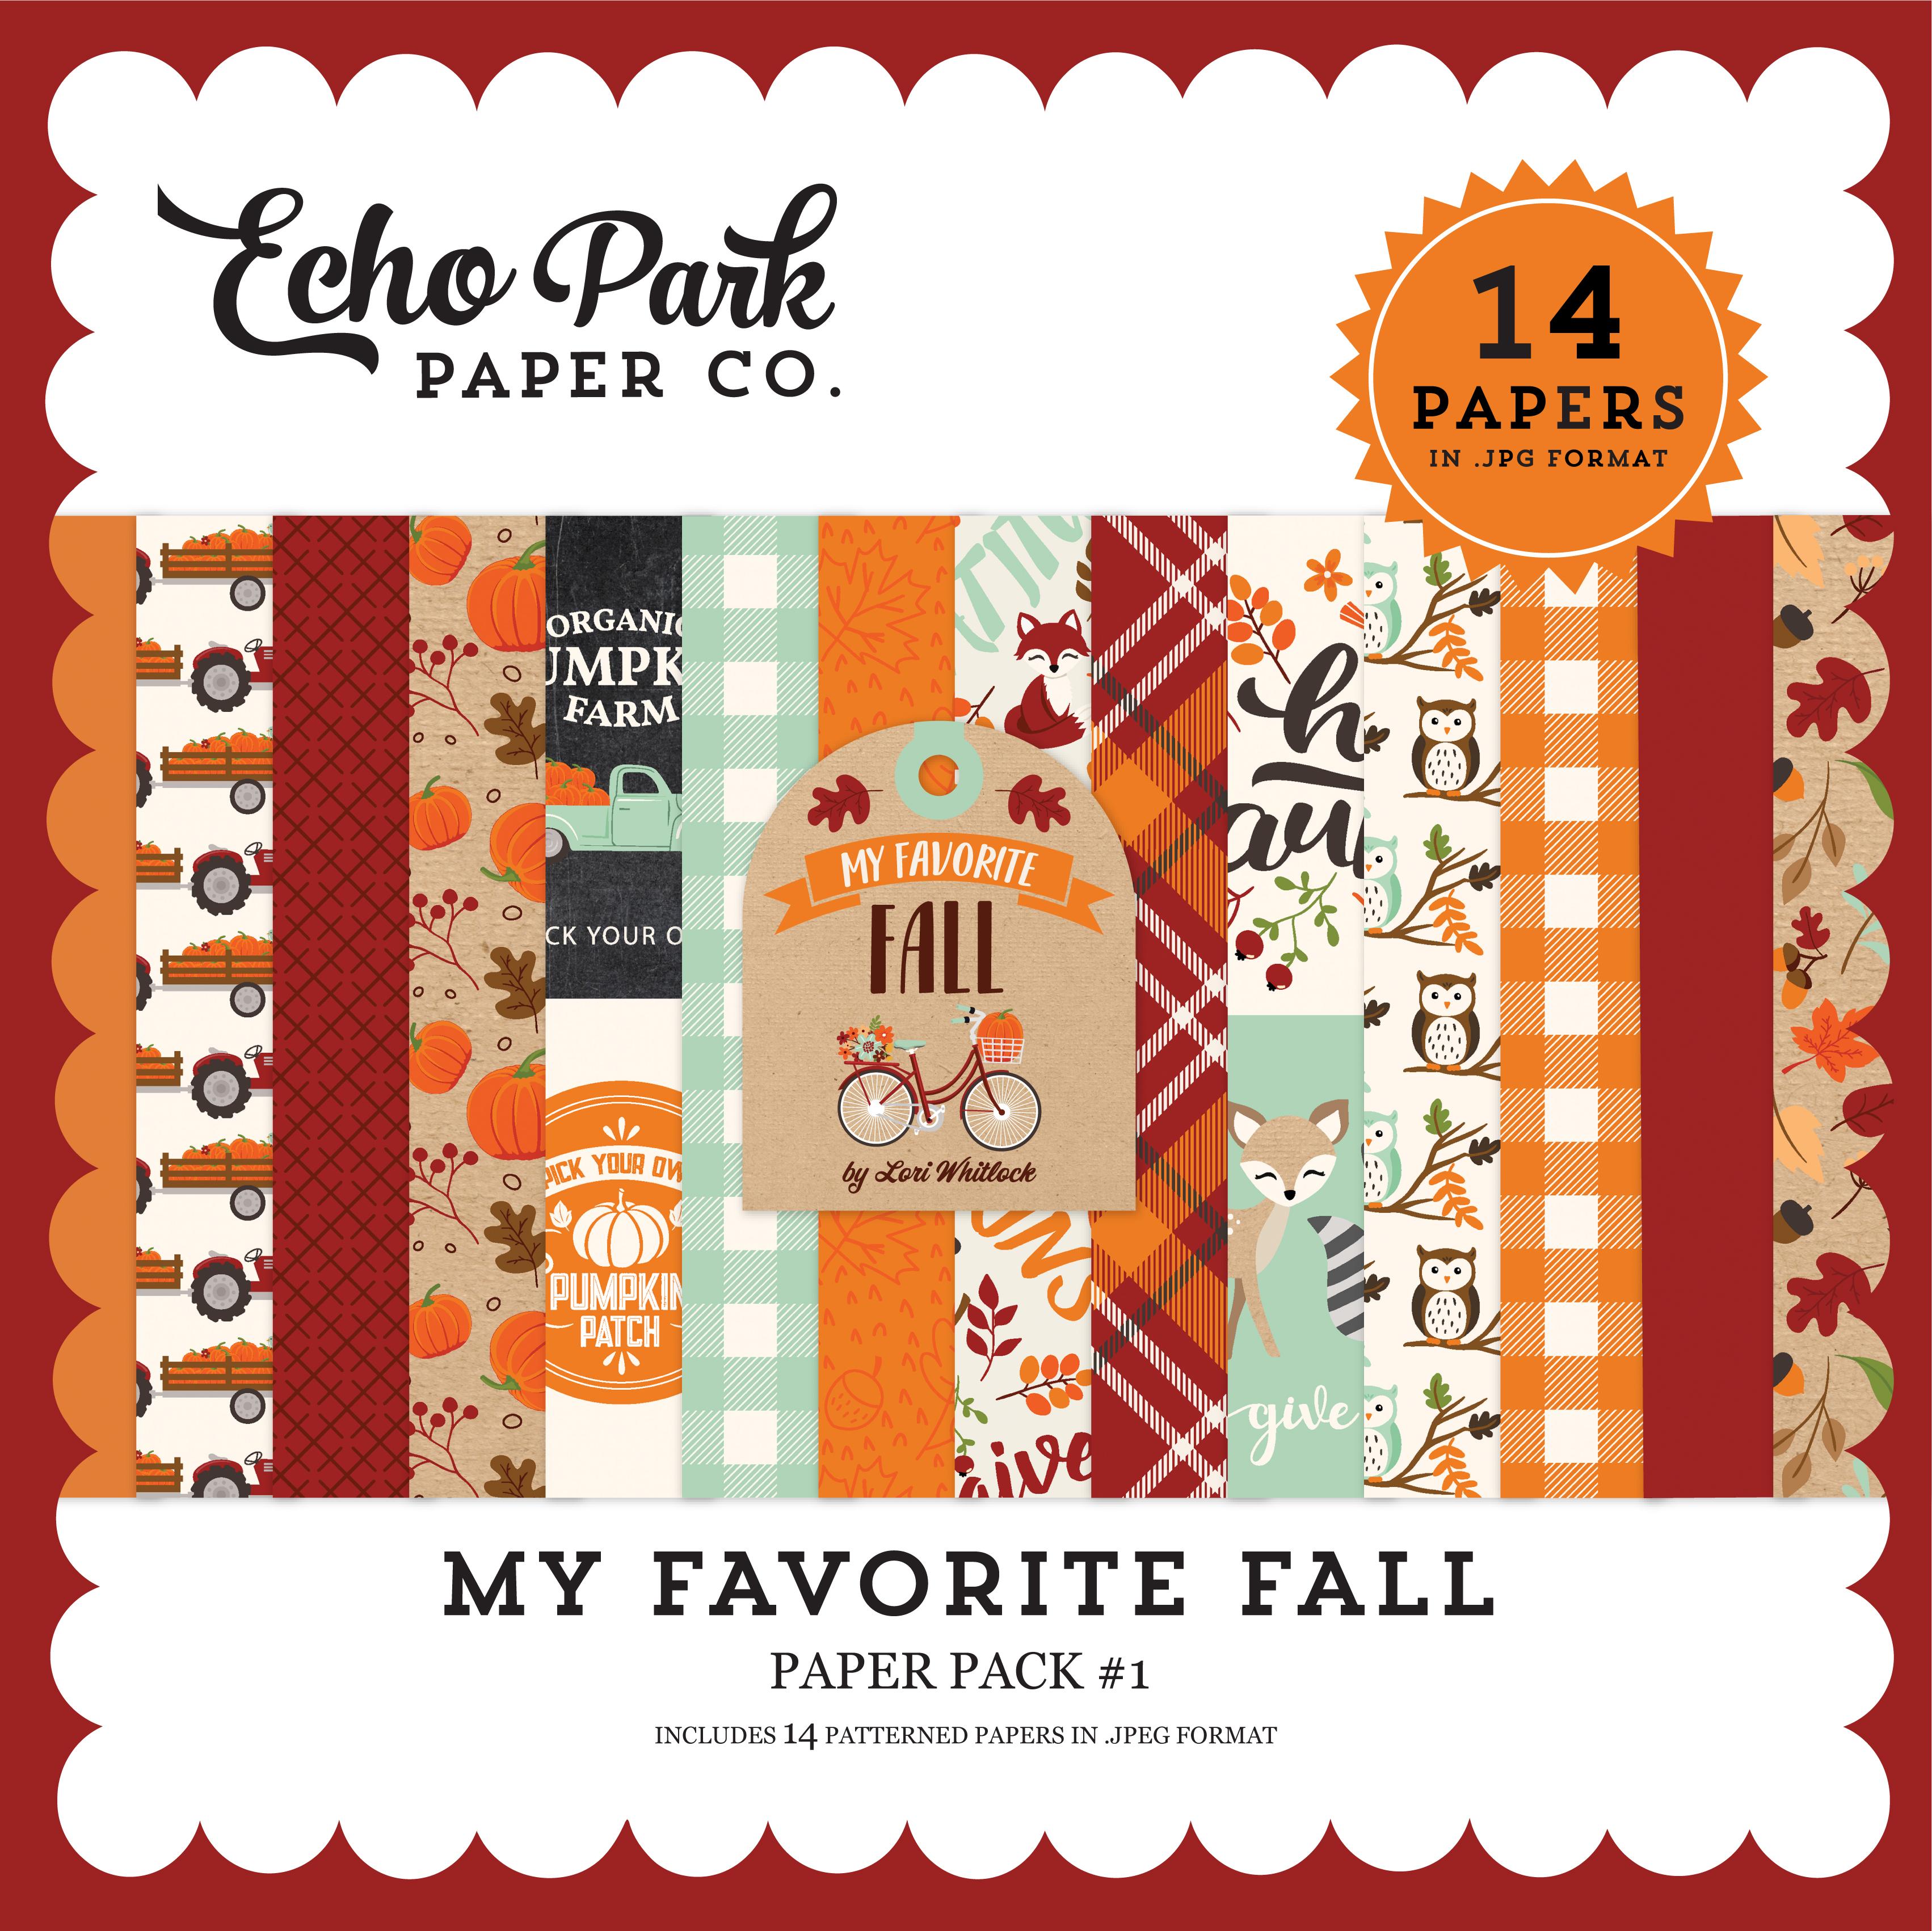 My Favorite Fall Paper Pack #1